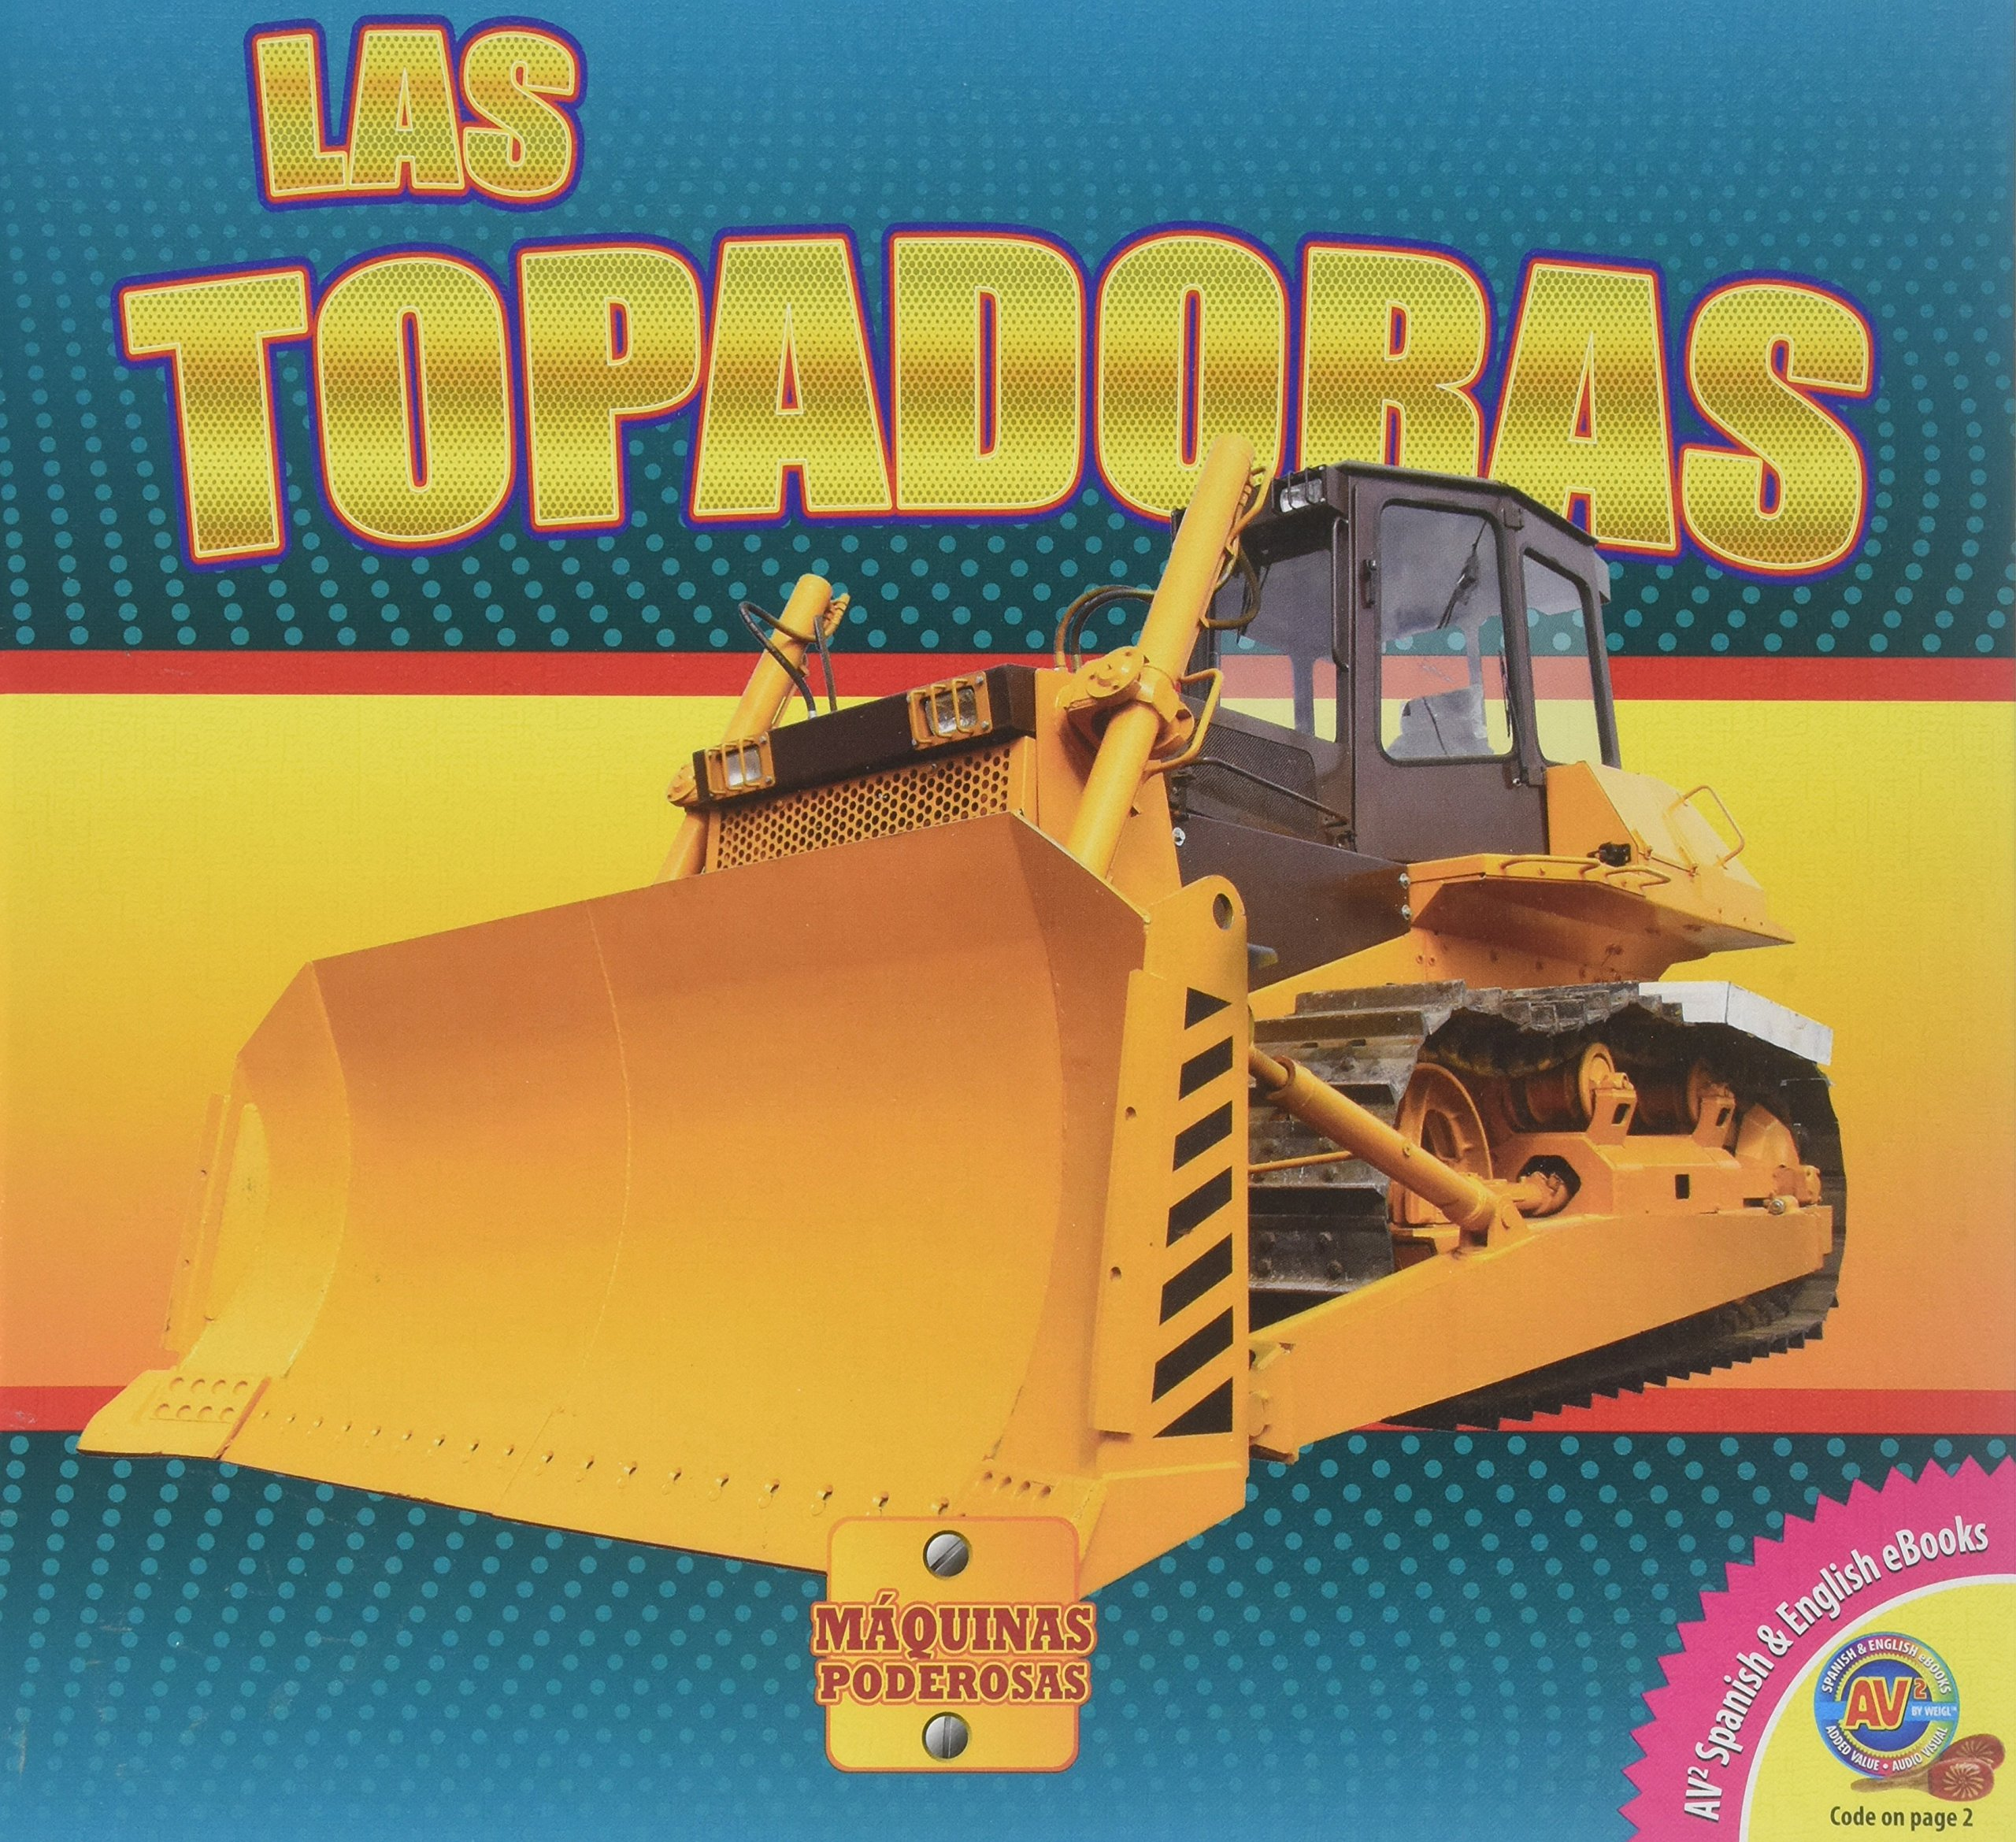 Las Topadoras (Maquinas Poderosas) (Spanish Edition) by Av2 by Weigl